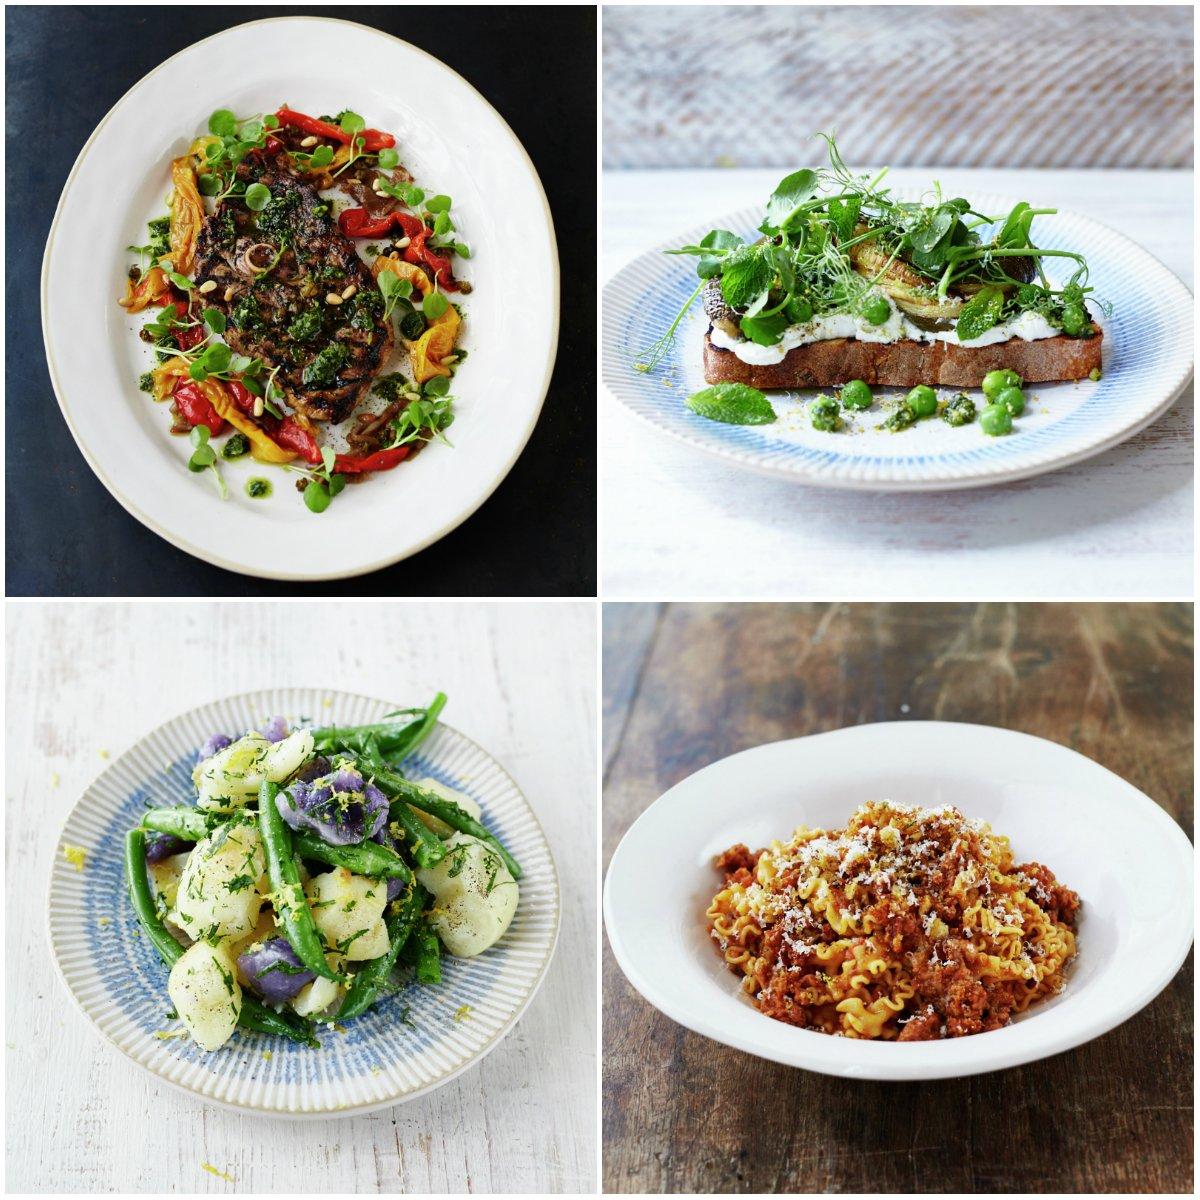 New Spring menu @JamiesItalianUK ! https://t.co/CRkQgRlnoD